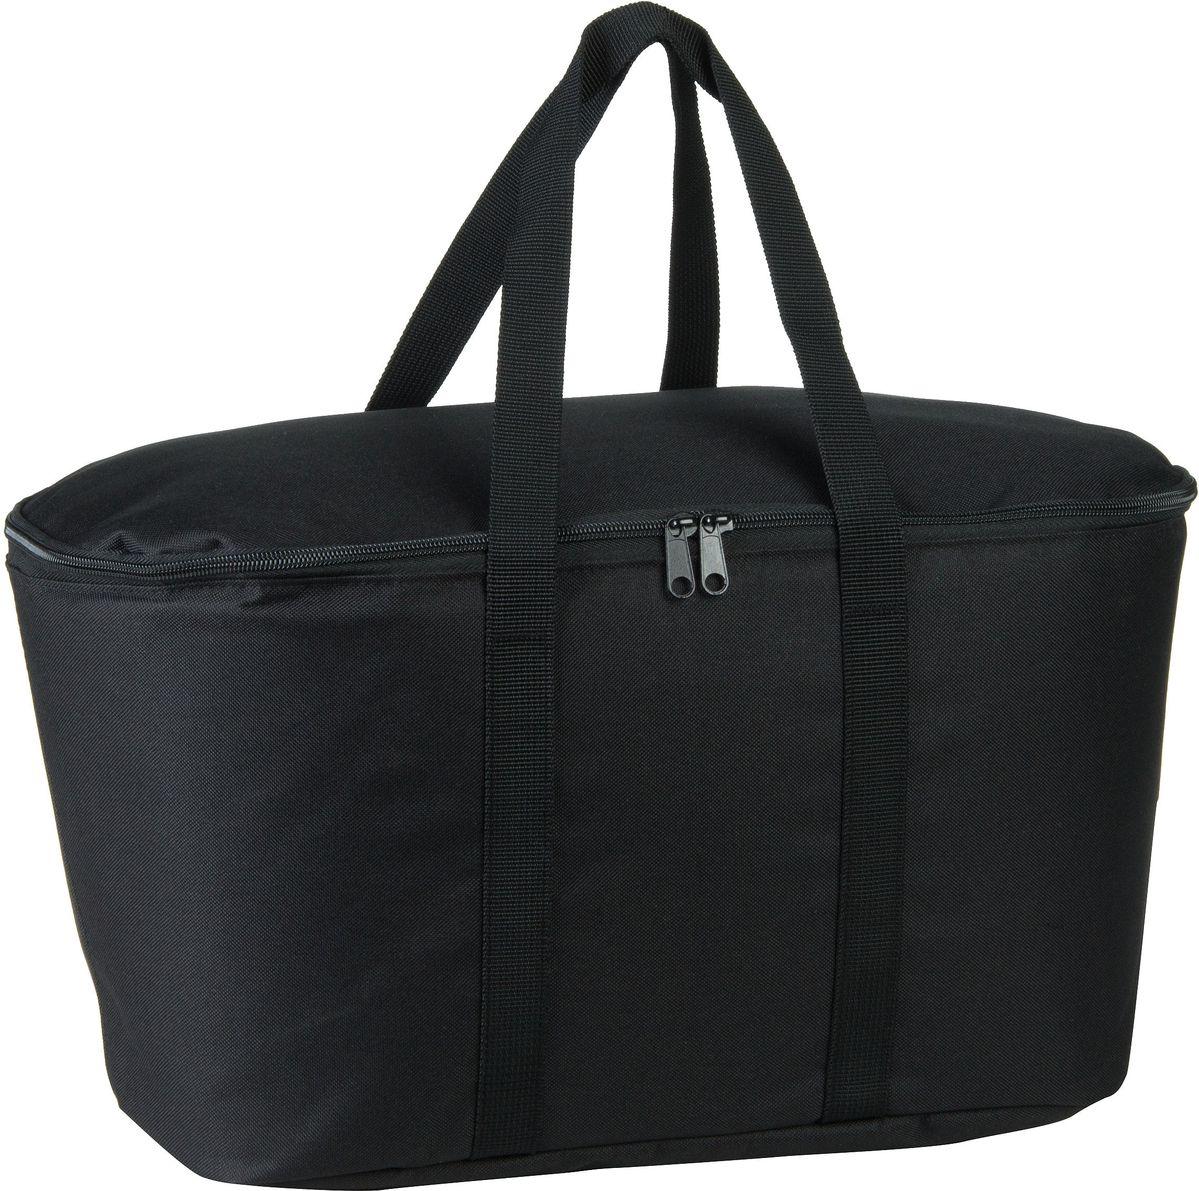 coolerbag Black